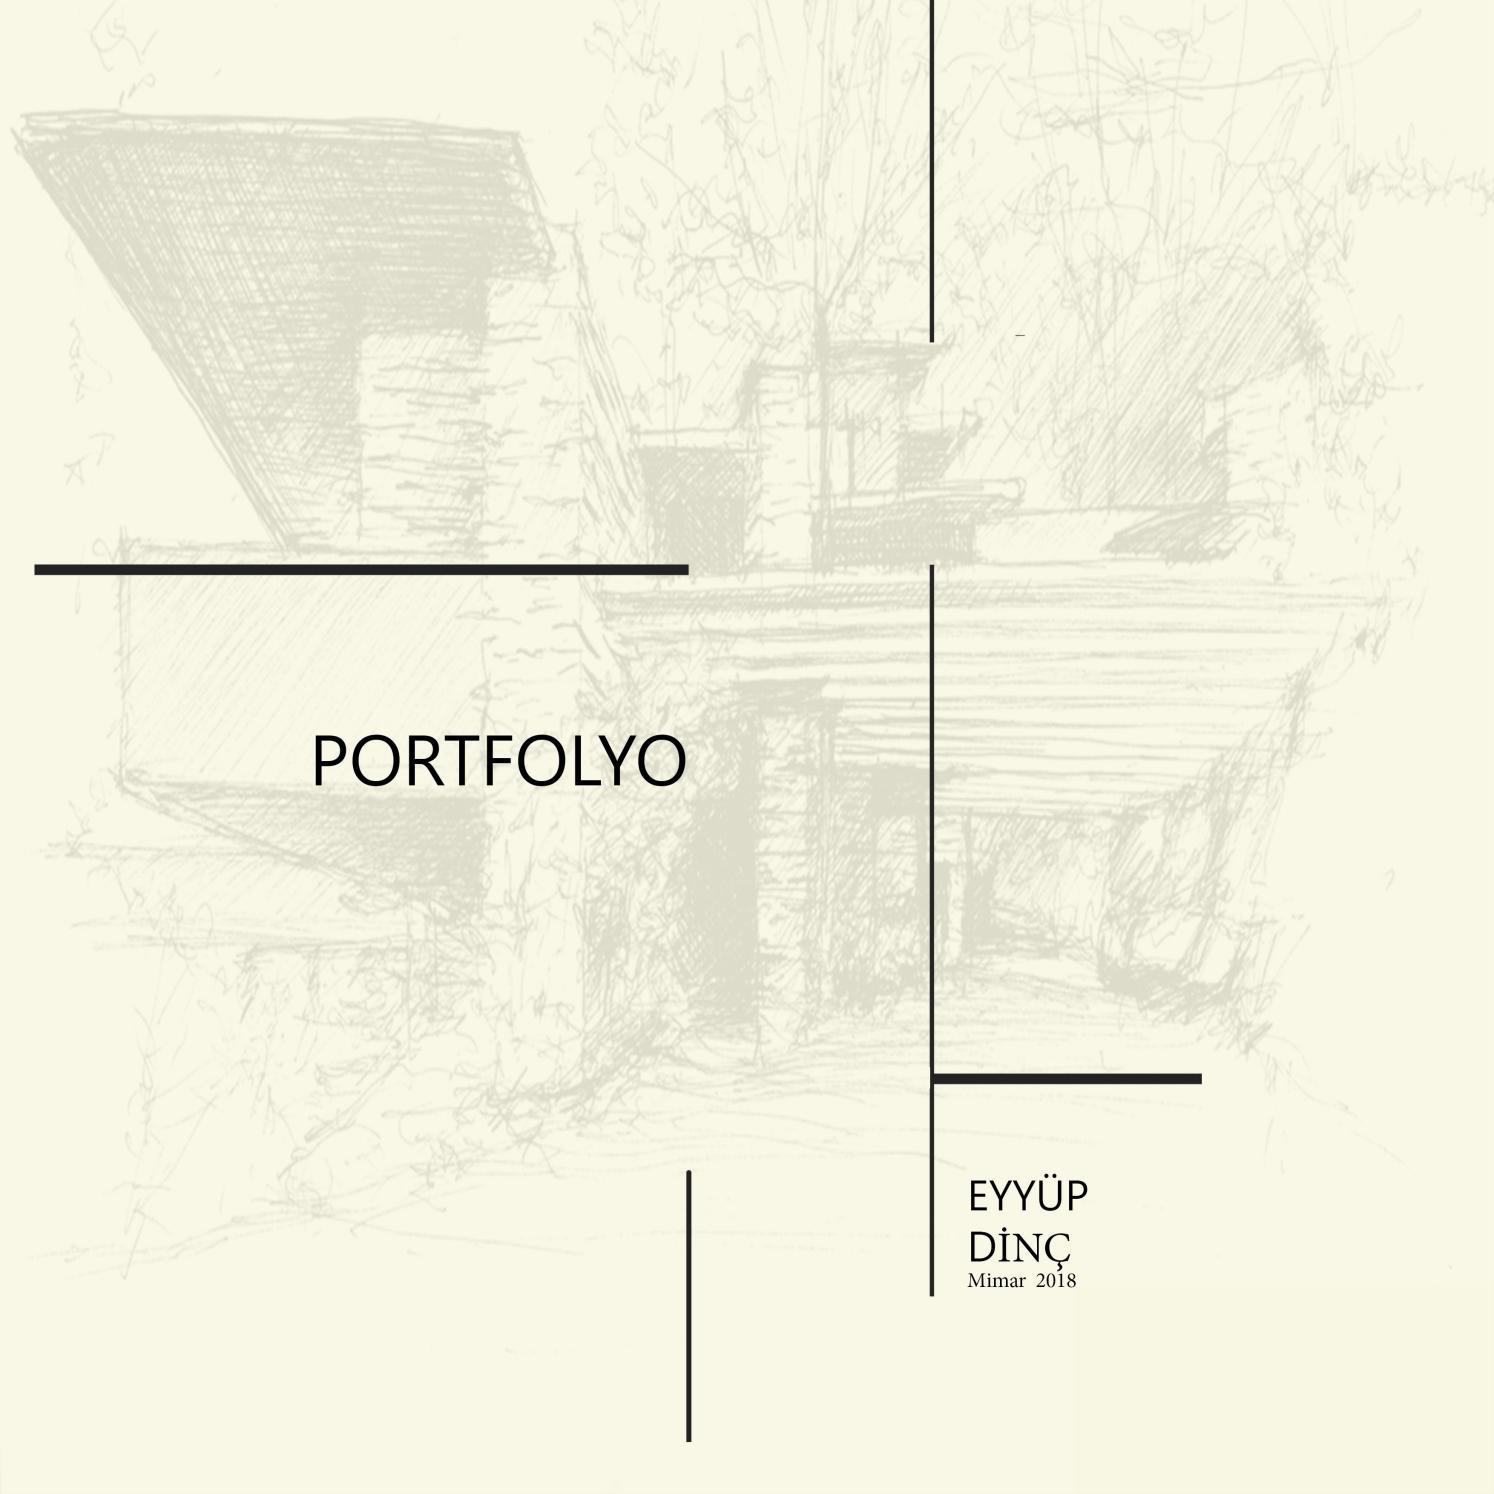 Eyyup Dinc Mimari Portfolyo By Eyyb Issuu